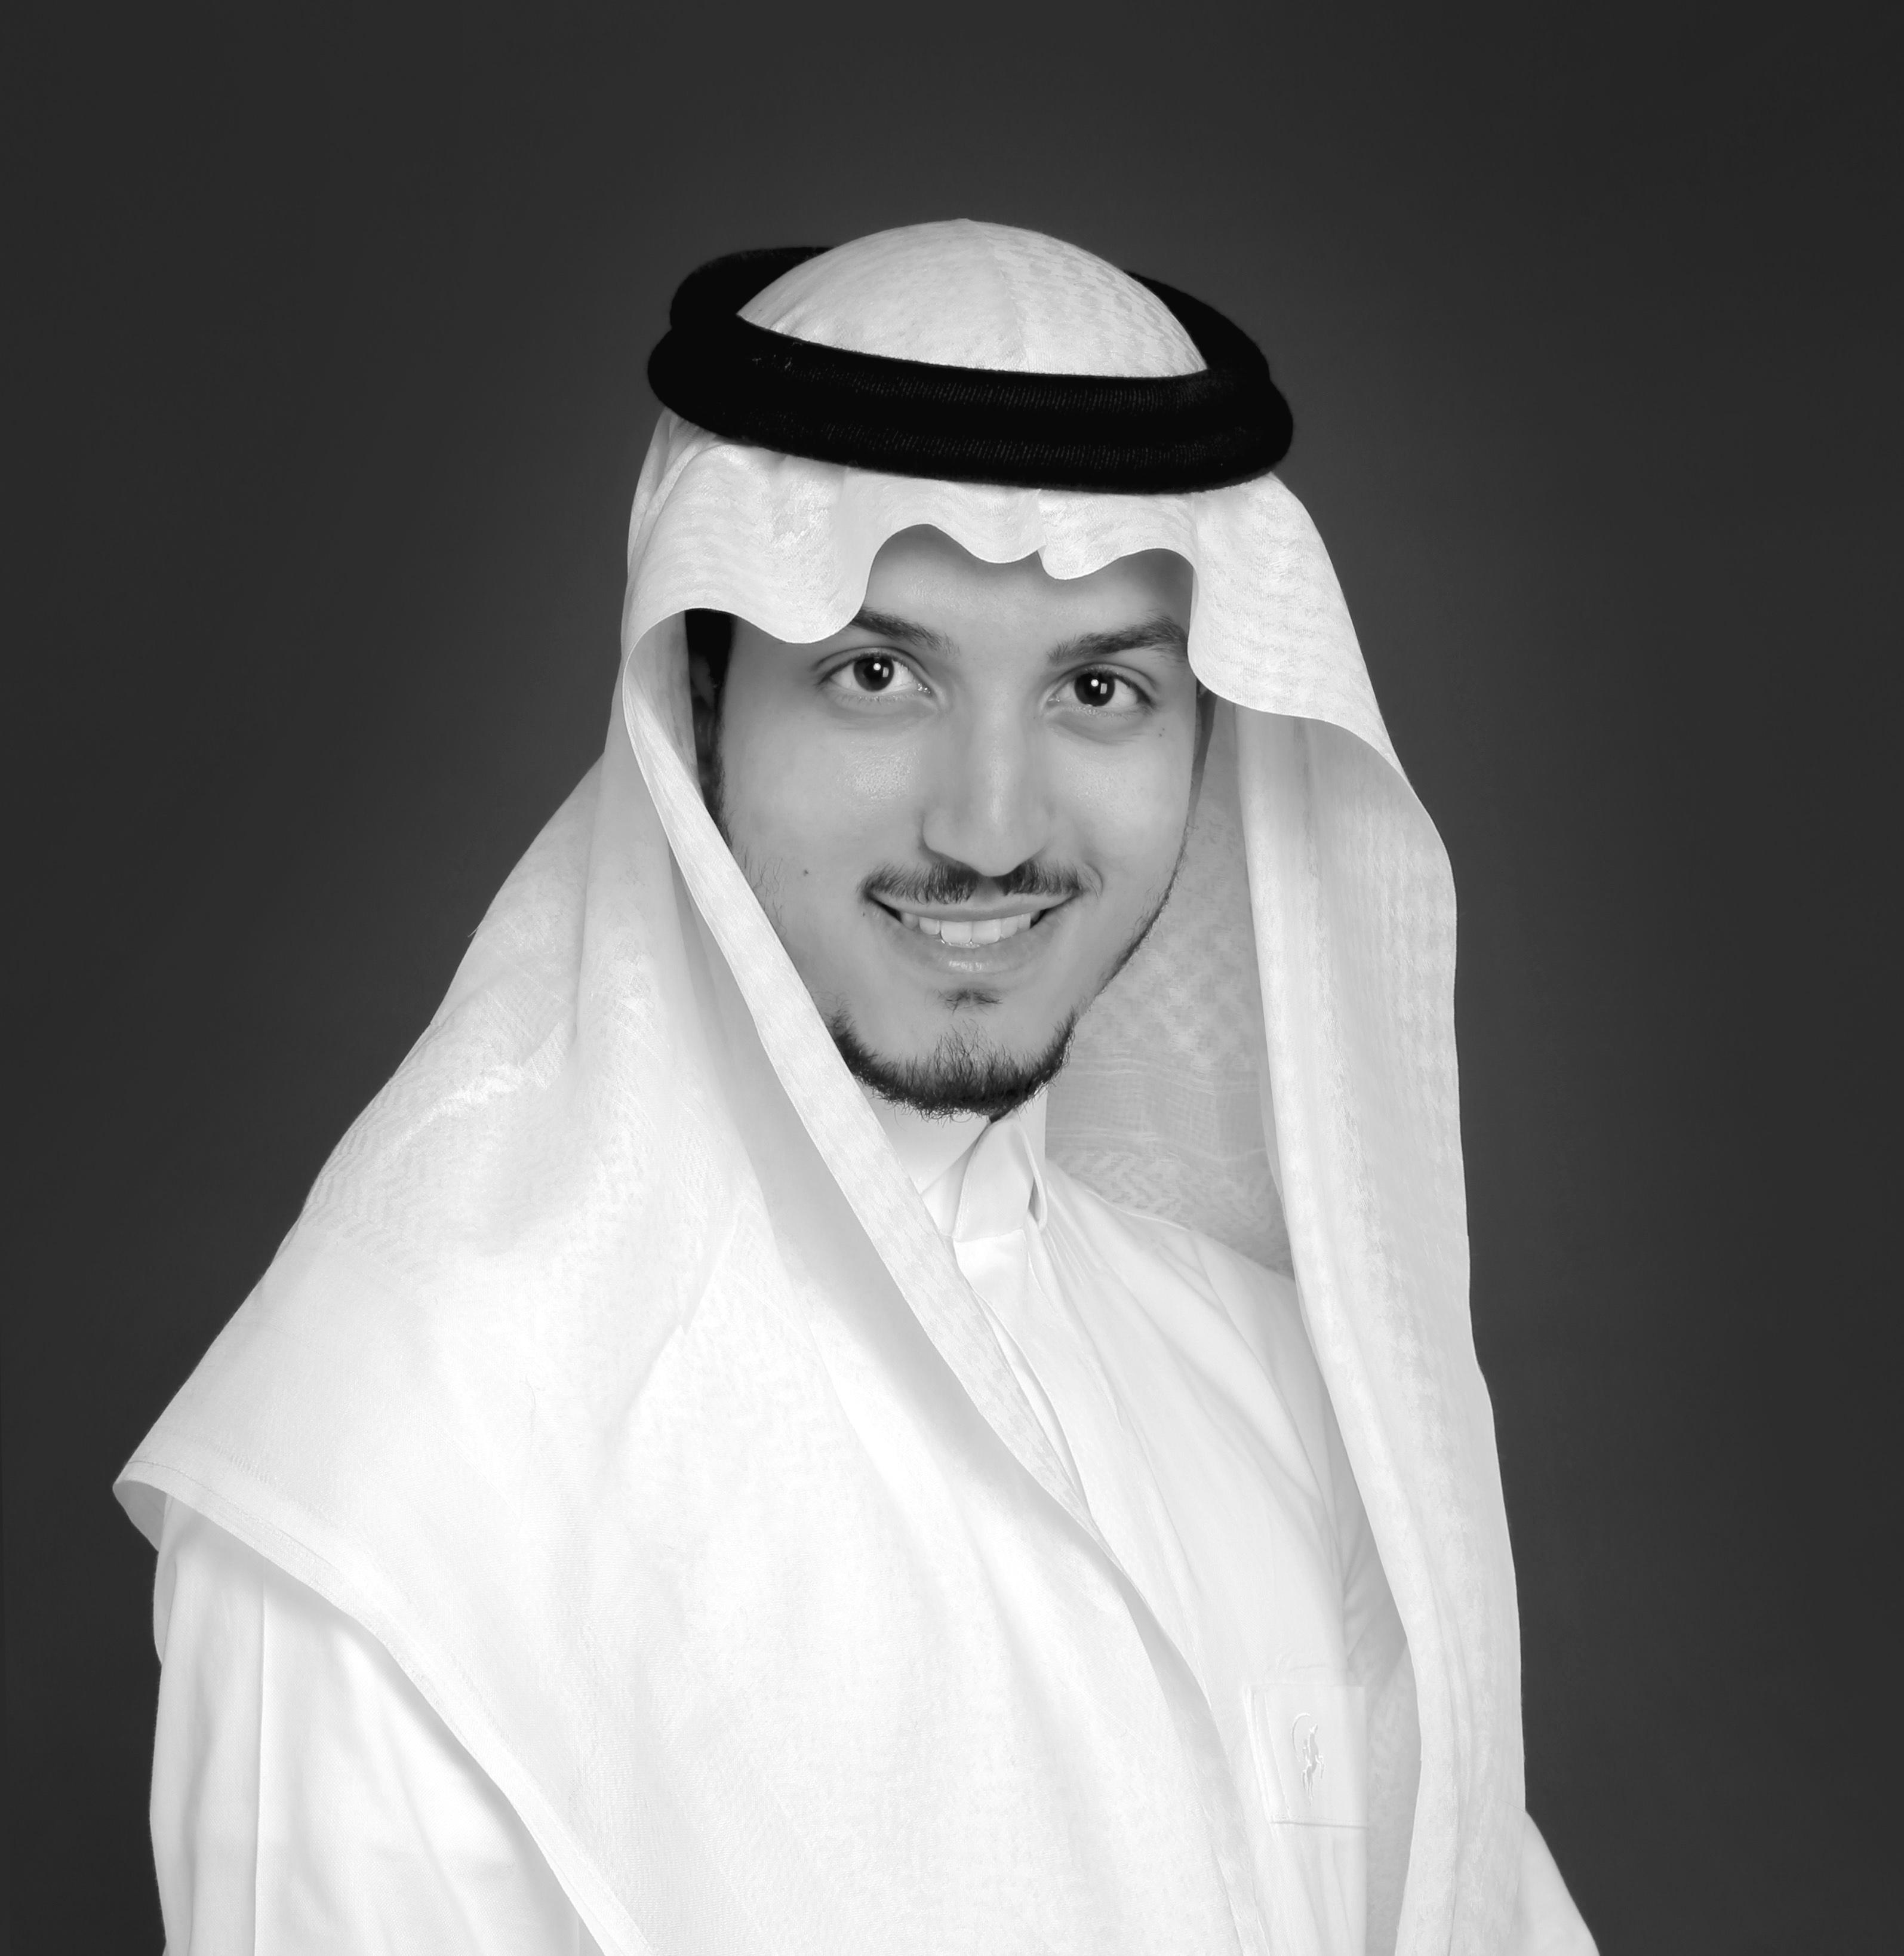 Mohammed Basnawi